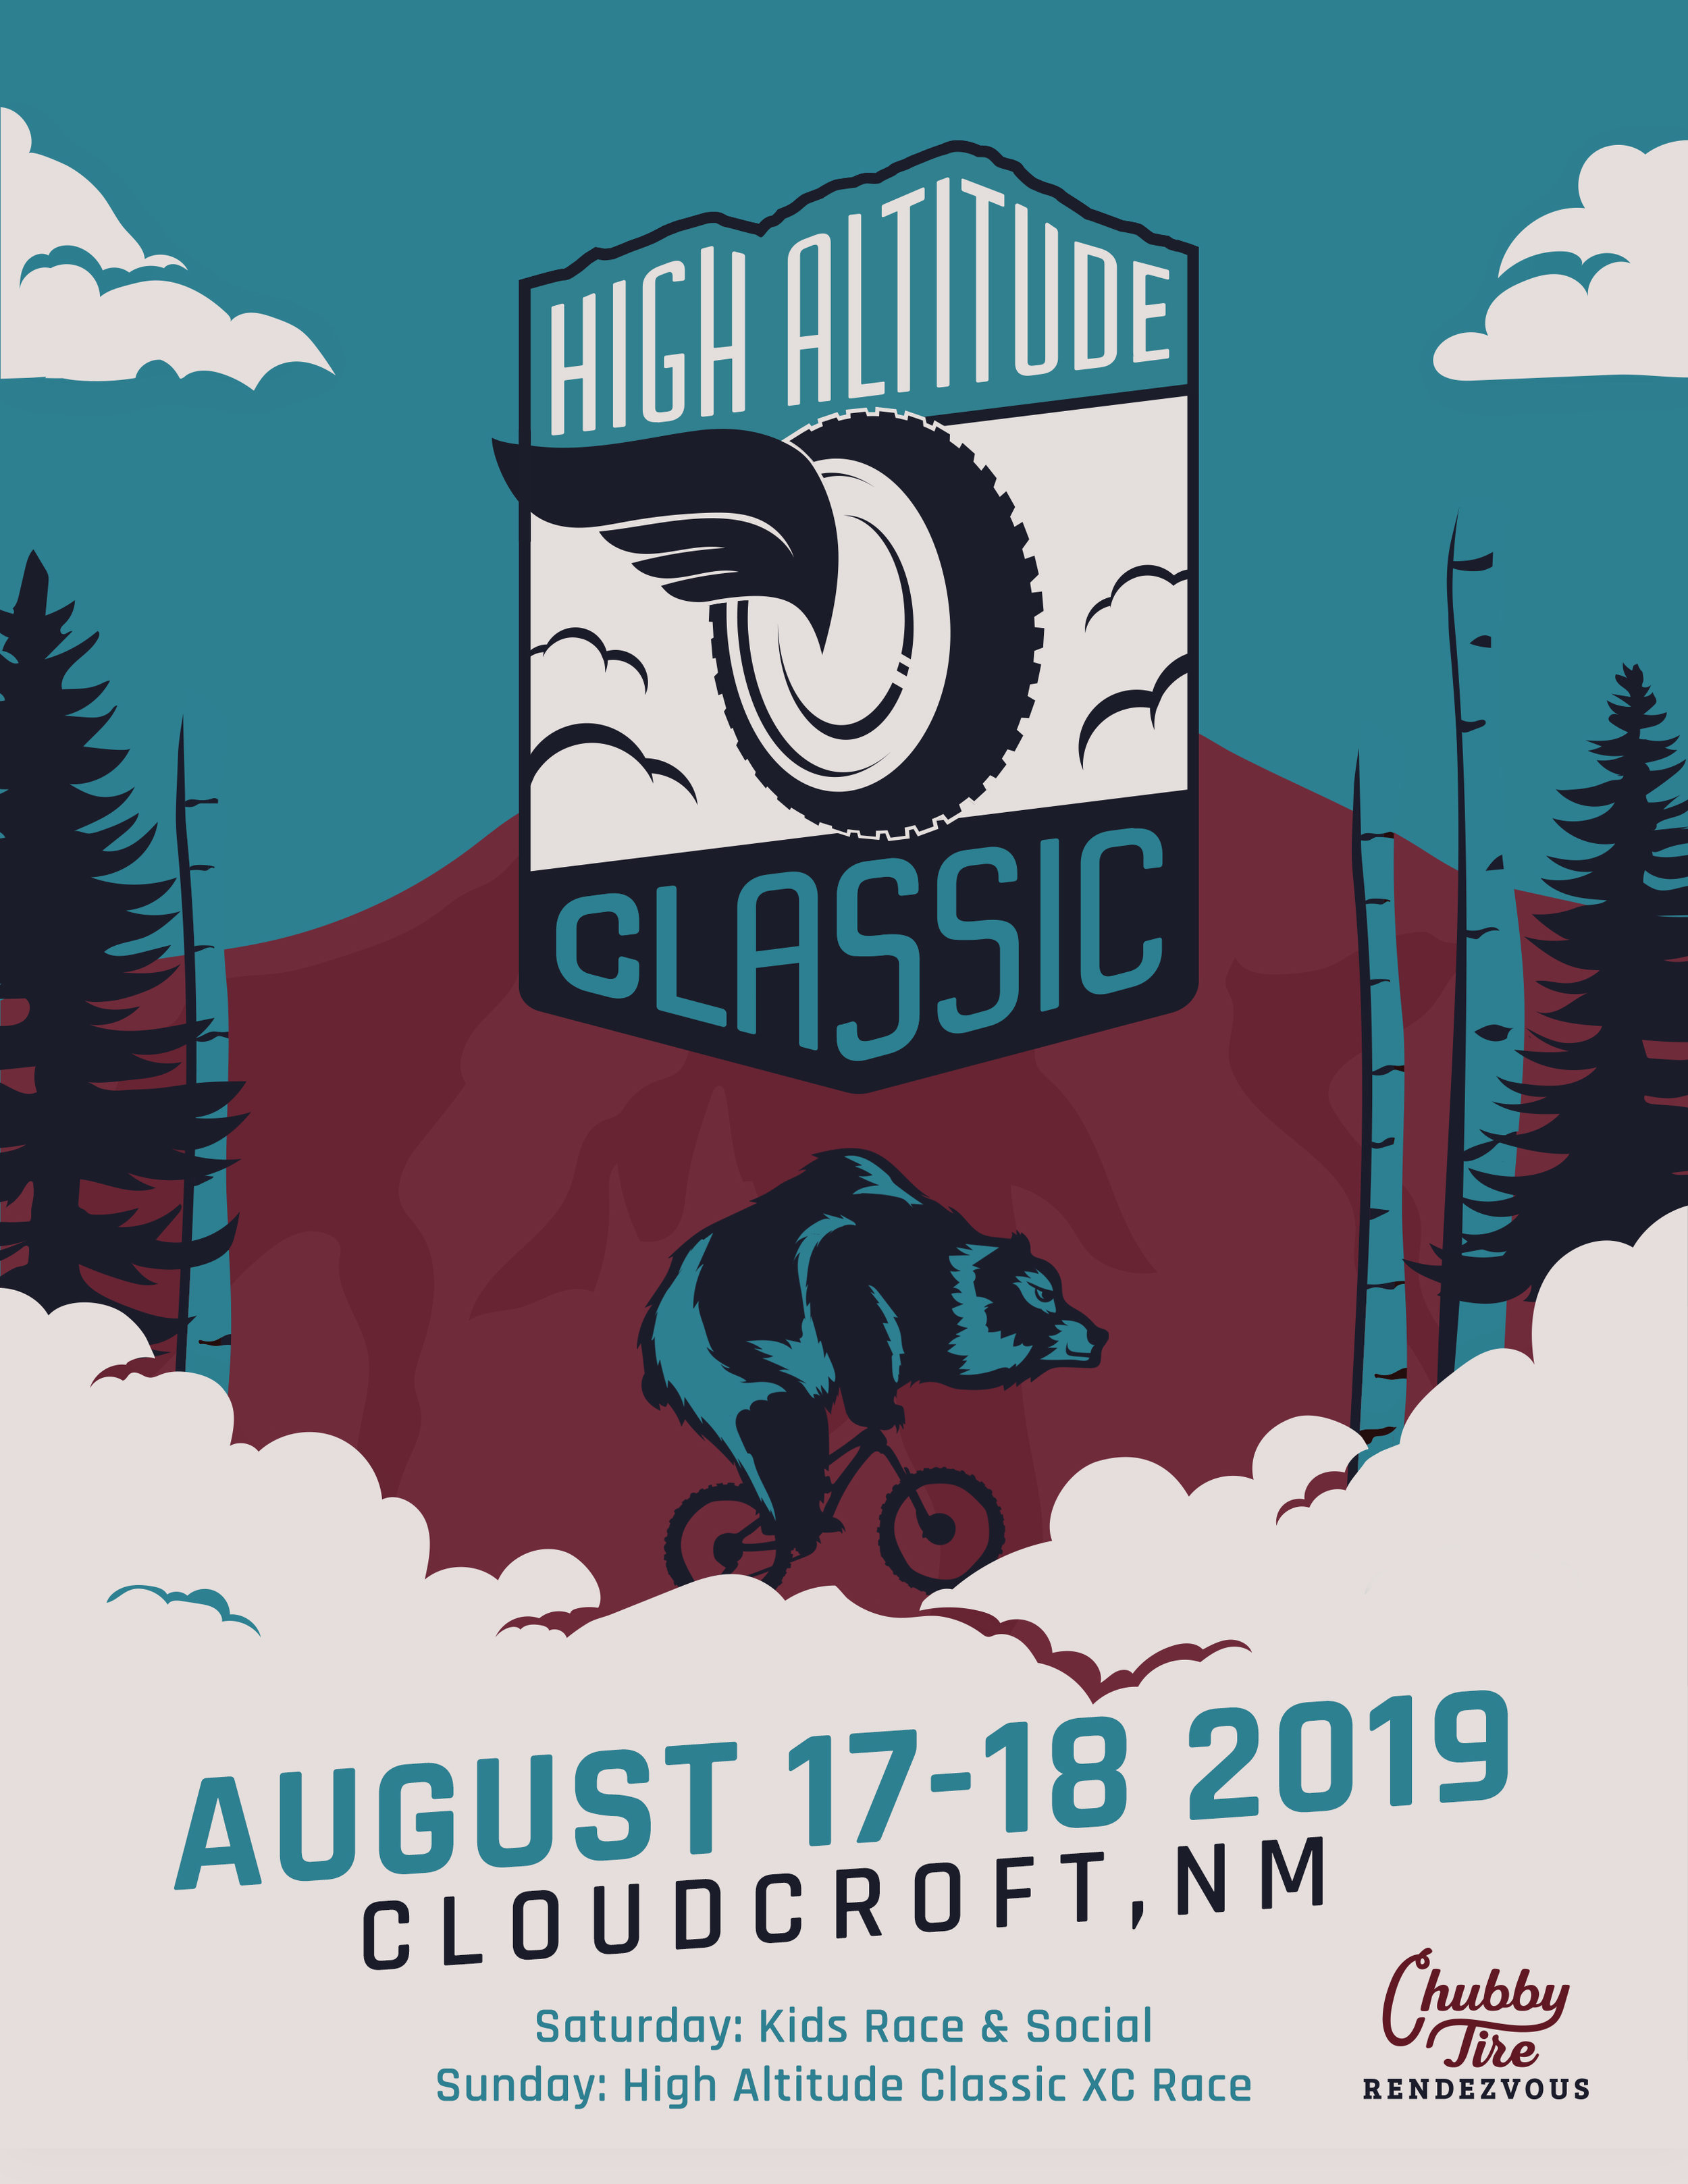 2019 High Altitude Classic Flyer.jpg